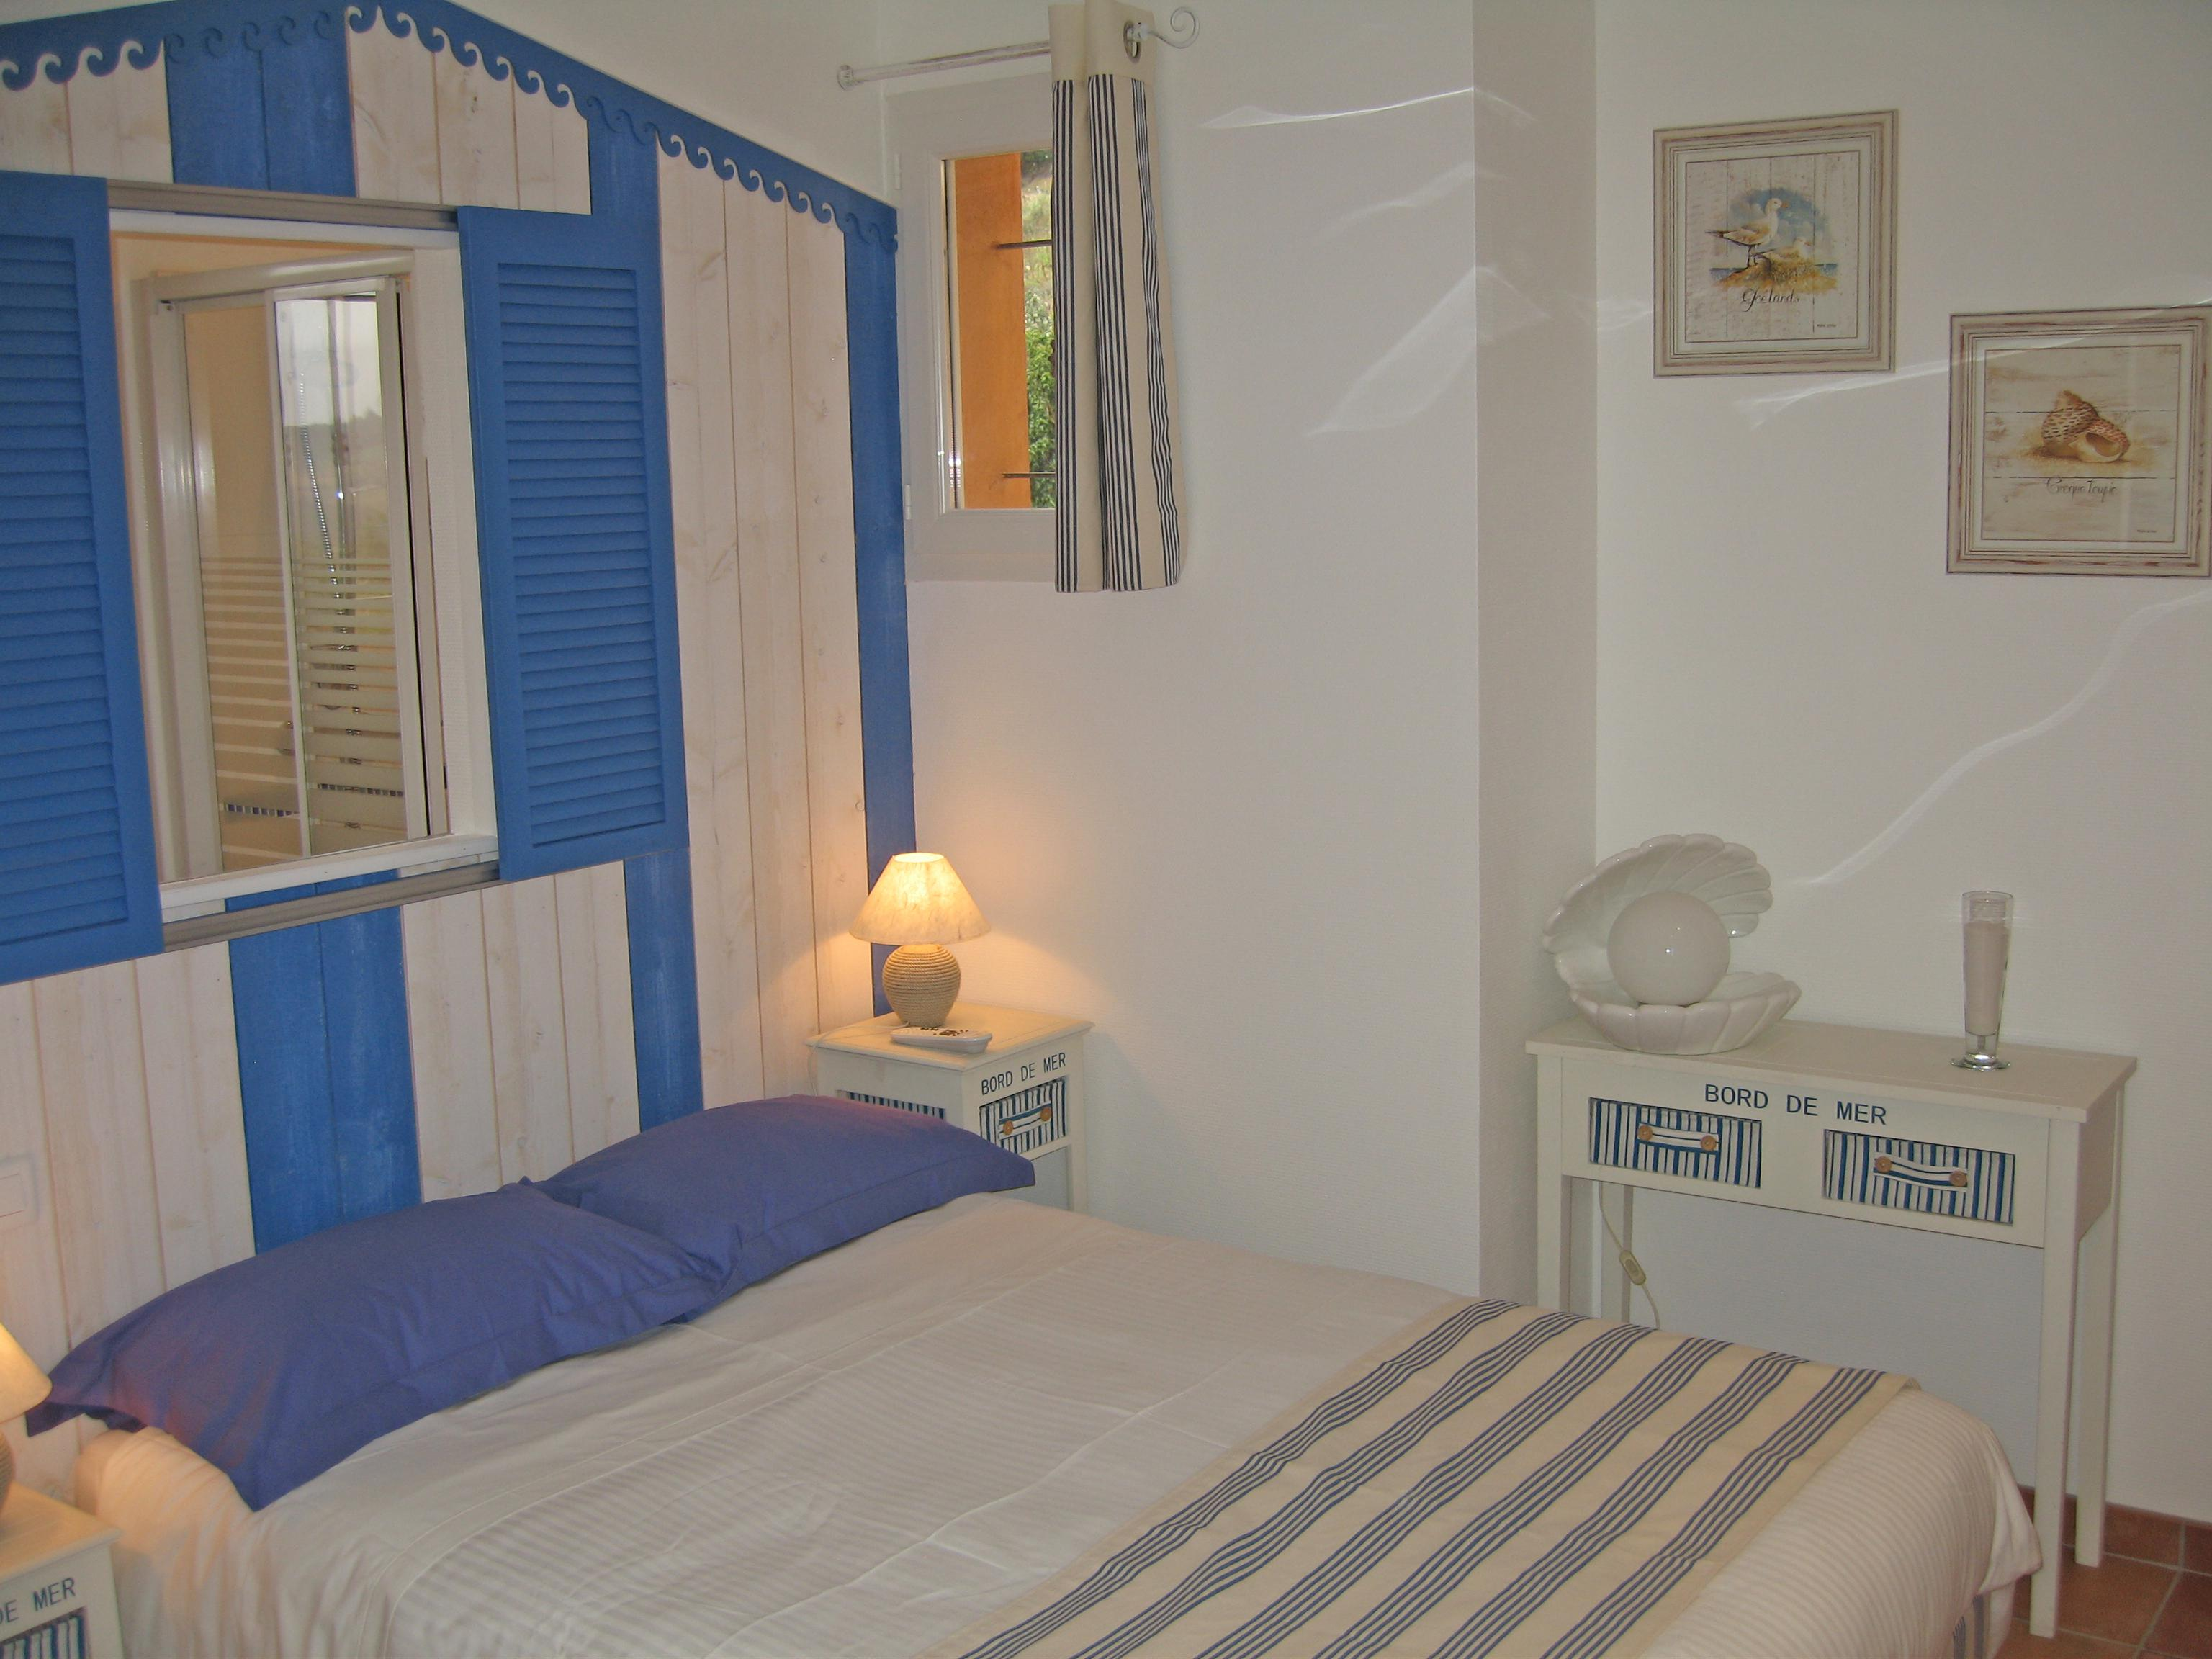 Studio-Salle de bain Privée-Mer - Tarif de base